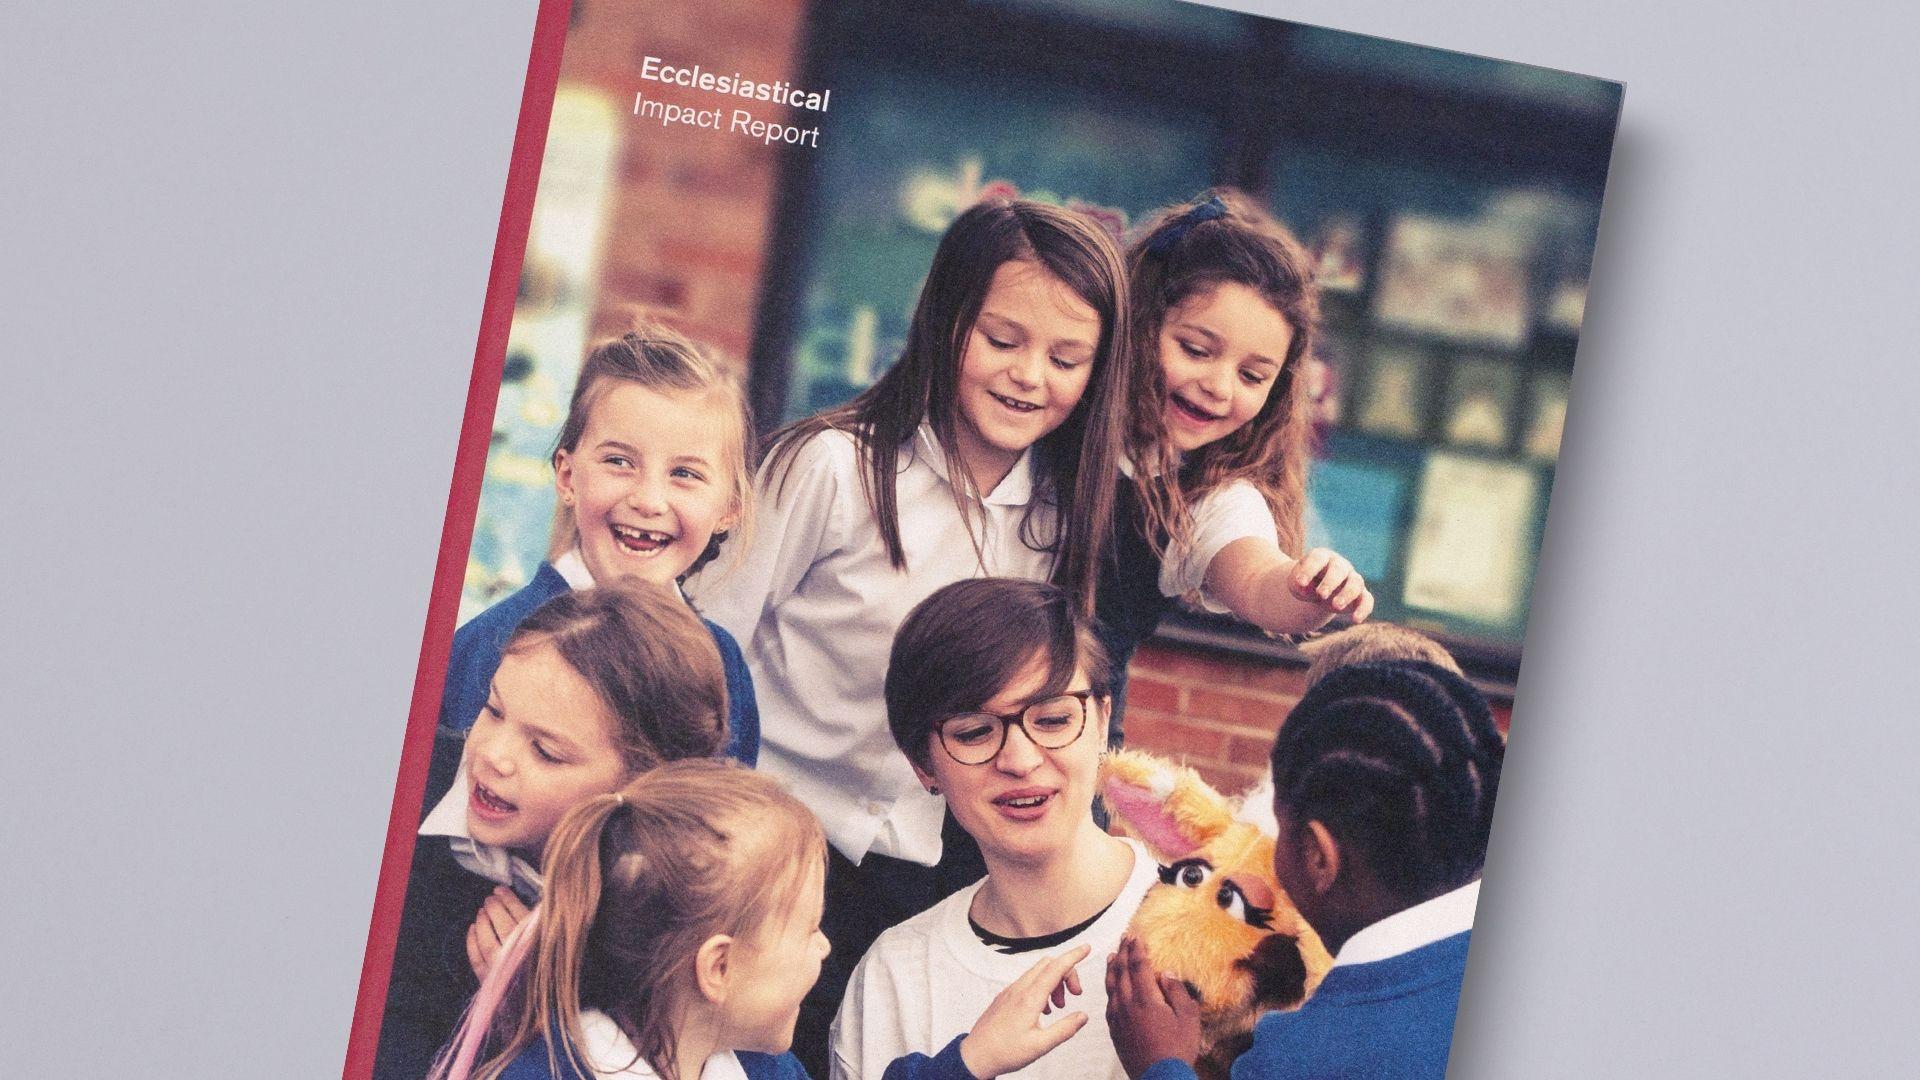 Fable Ecclesiastical Impact Report 02